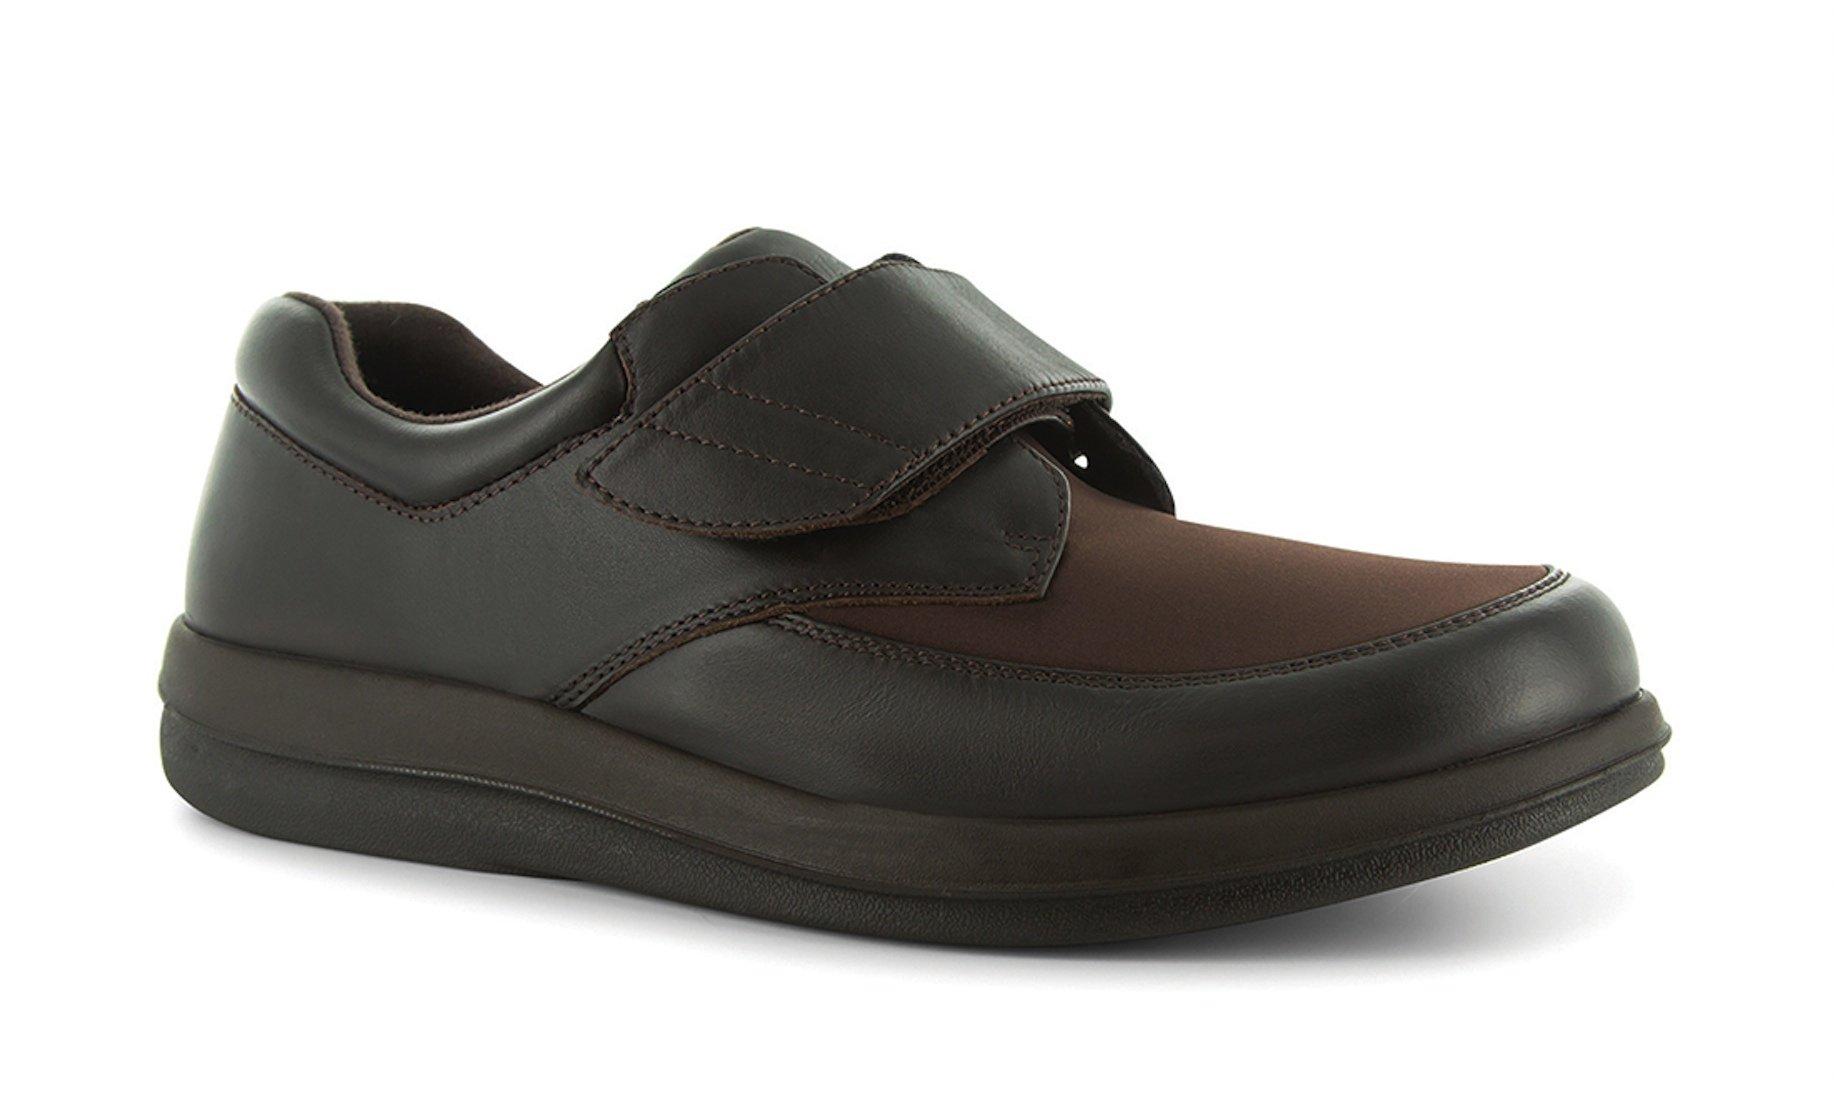 P W Minor Natural Men's Therapeutic Diabetic Extra Depth Shoe: Brown 14 Medium (D) Velcro